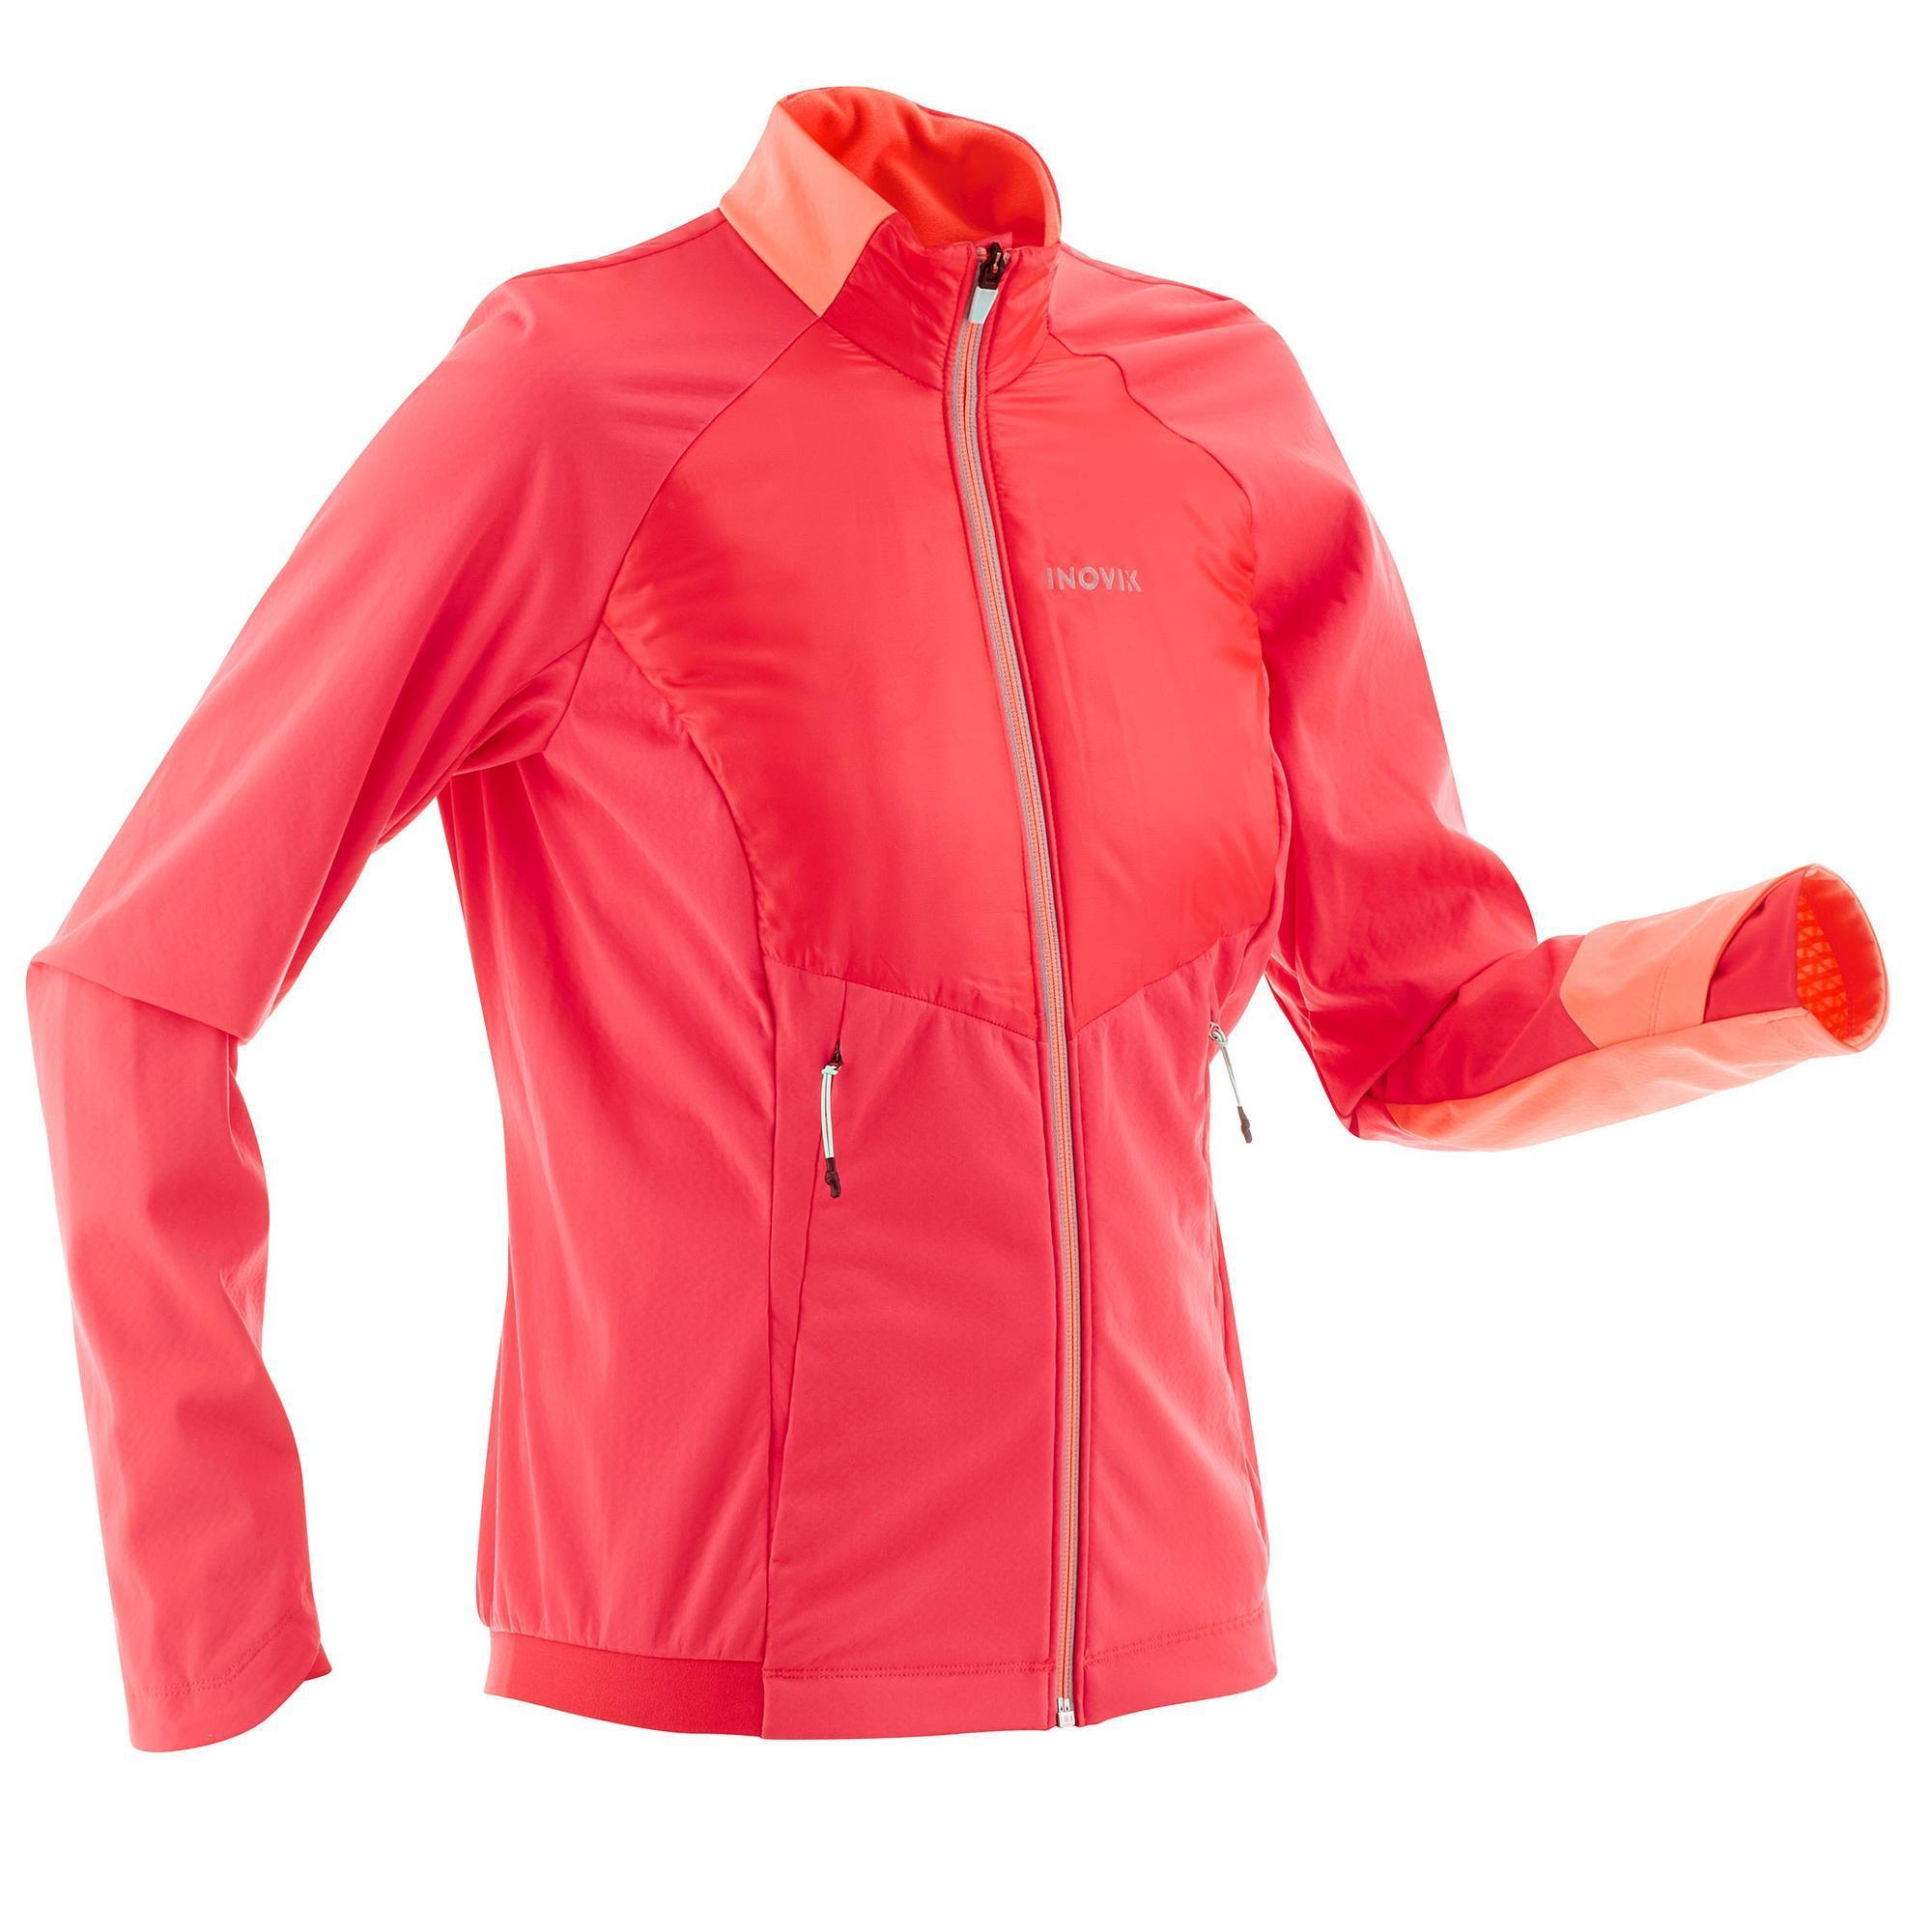 veste chaude de ski de fond femme xc s jkt 550 rose quechua. Black Bedroom Furniture Sets. Home Design Ideas